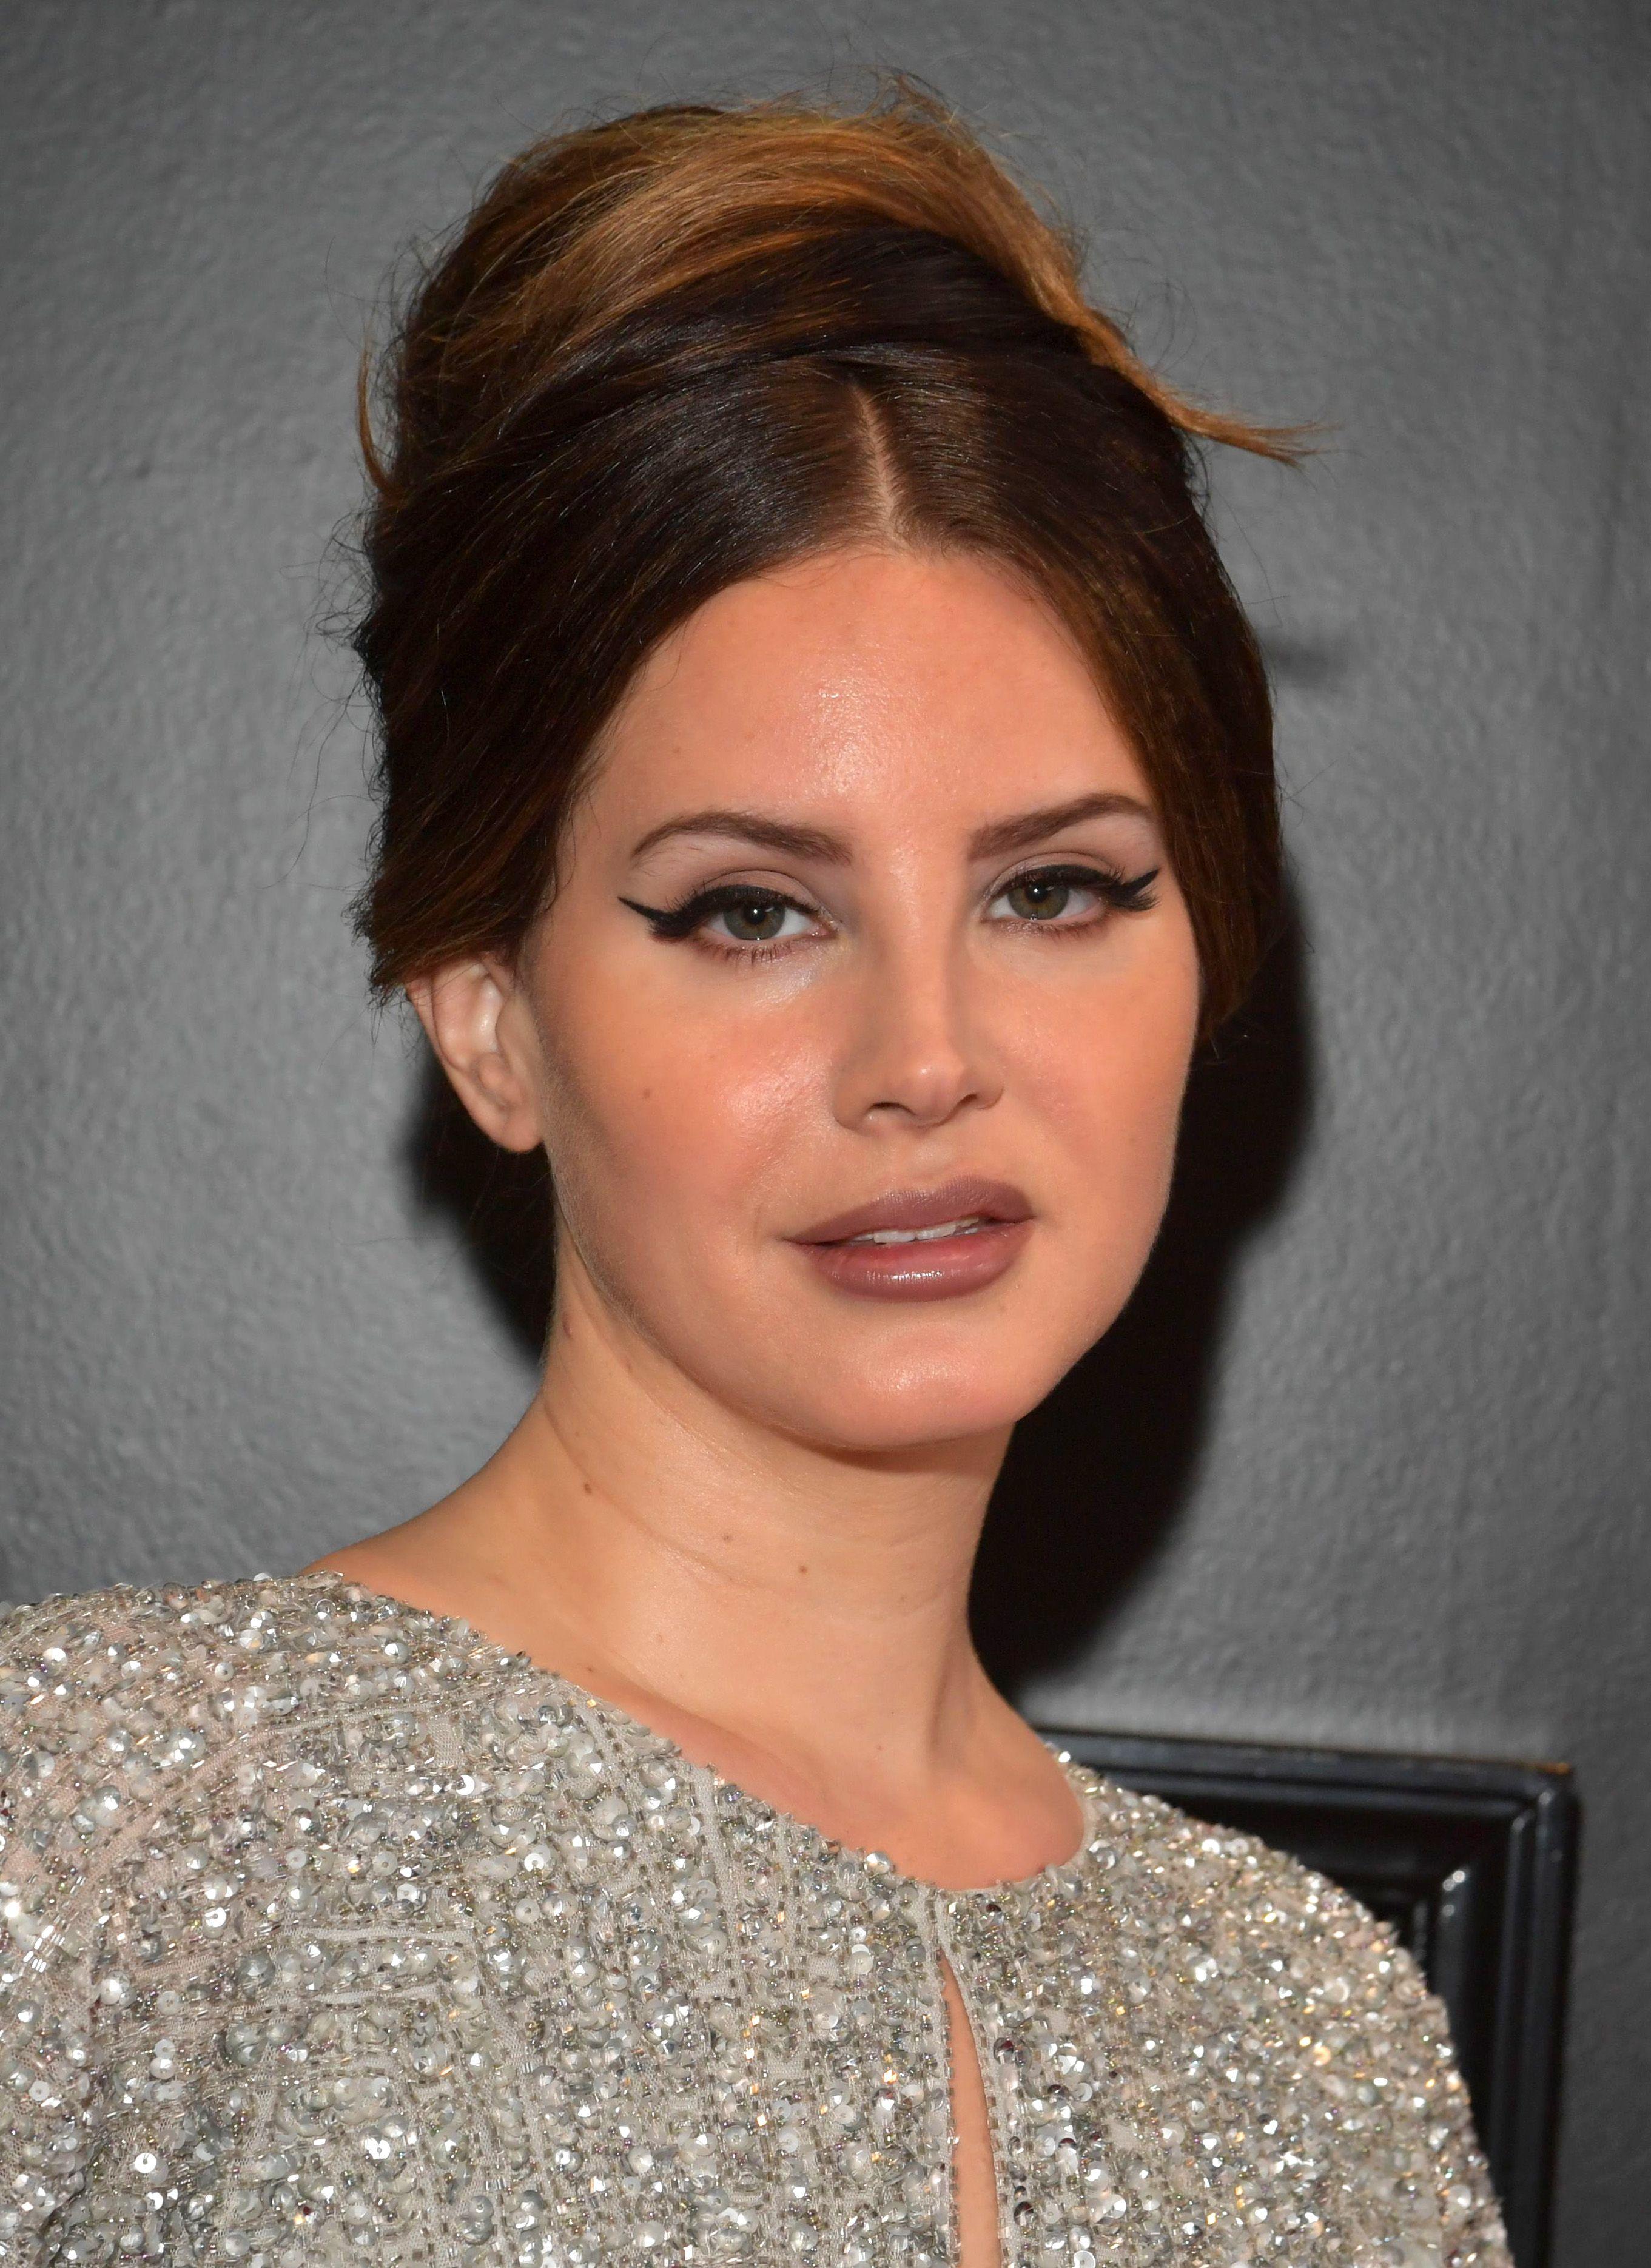 Lana Del Rey Shares Details Of Poetry Audiobook